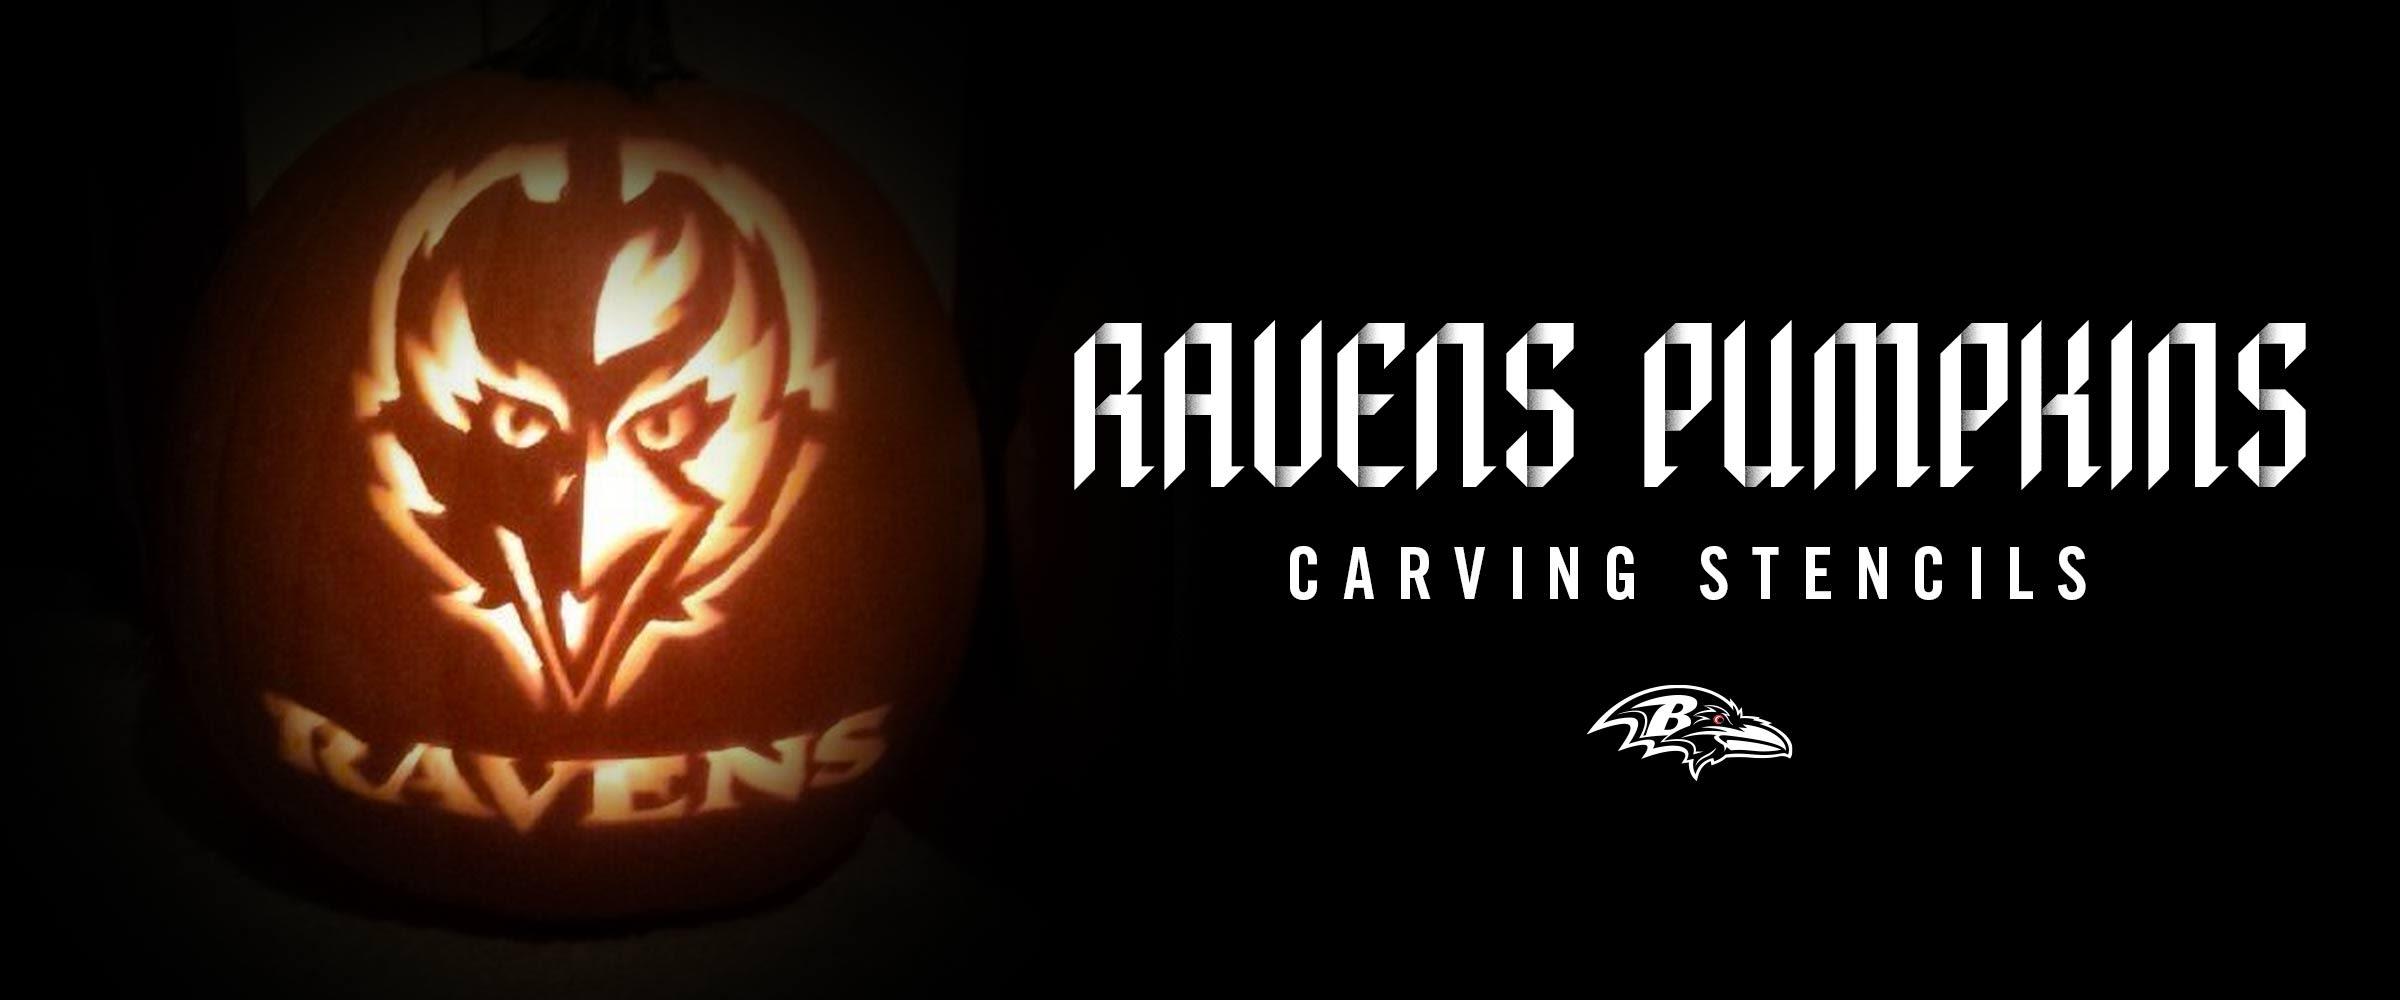 Ravens Pumpkin Carving Stencils